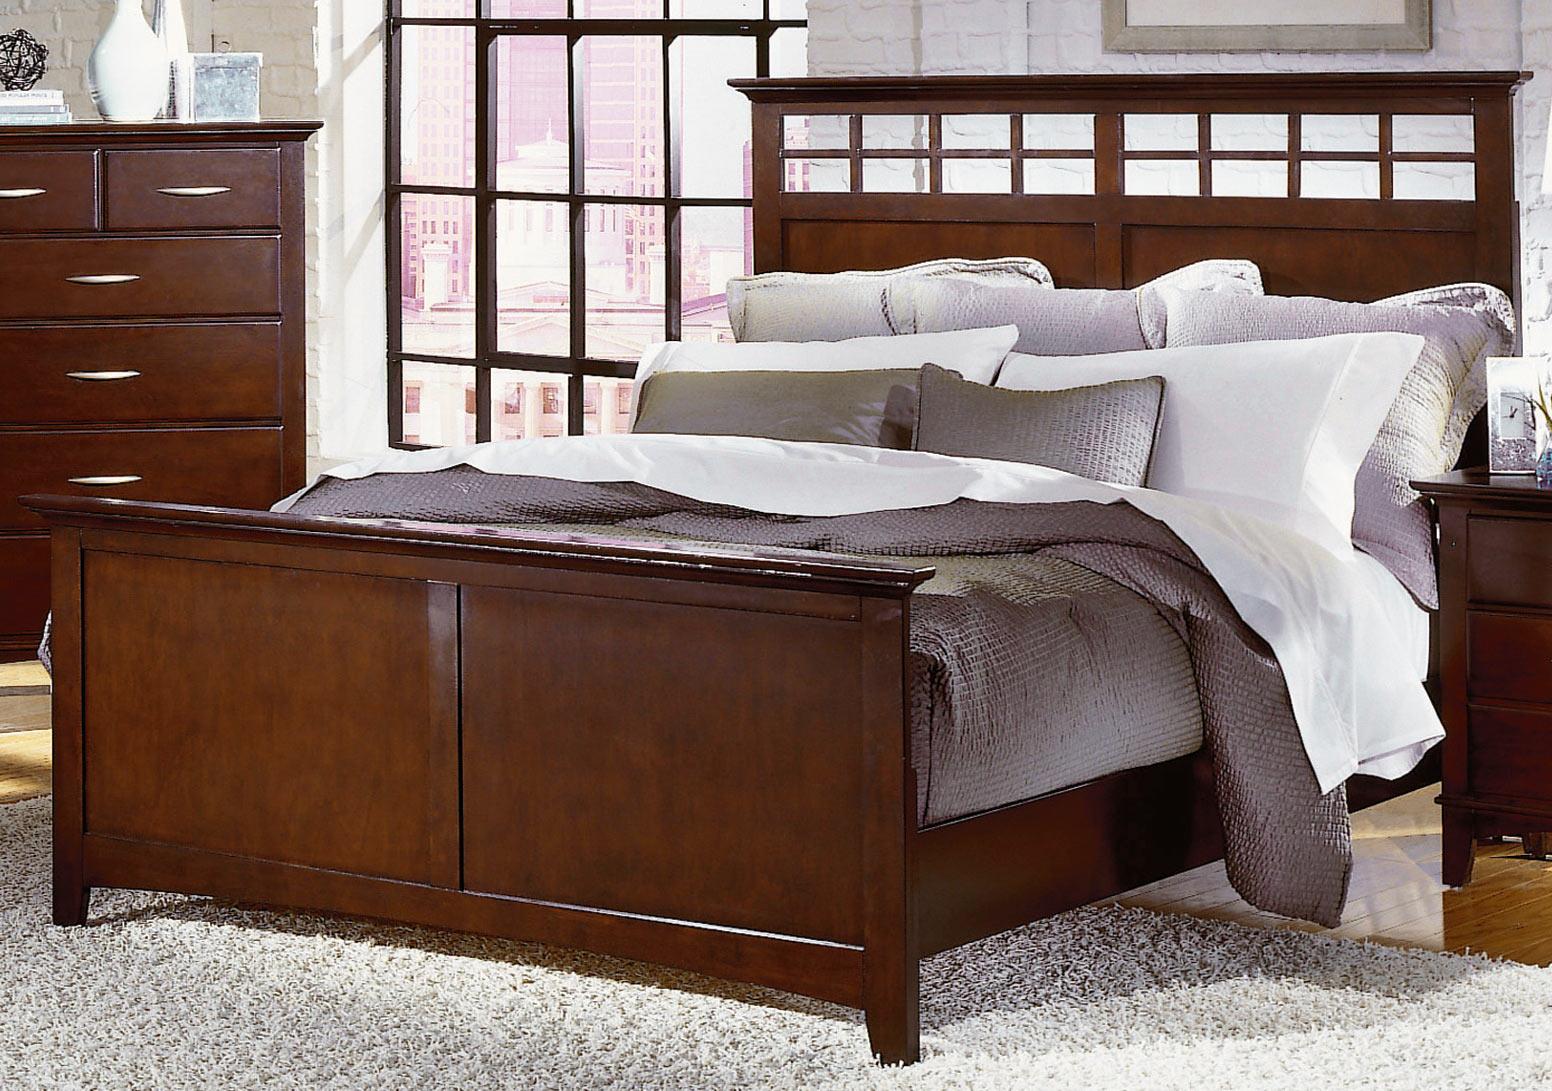 Homelegance Mandalay Bedroom Collection B980 At